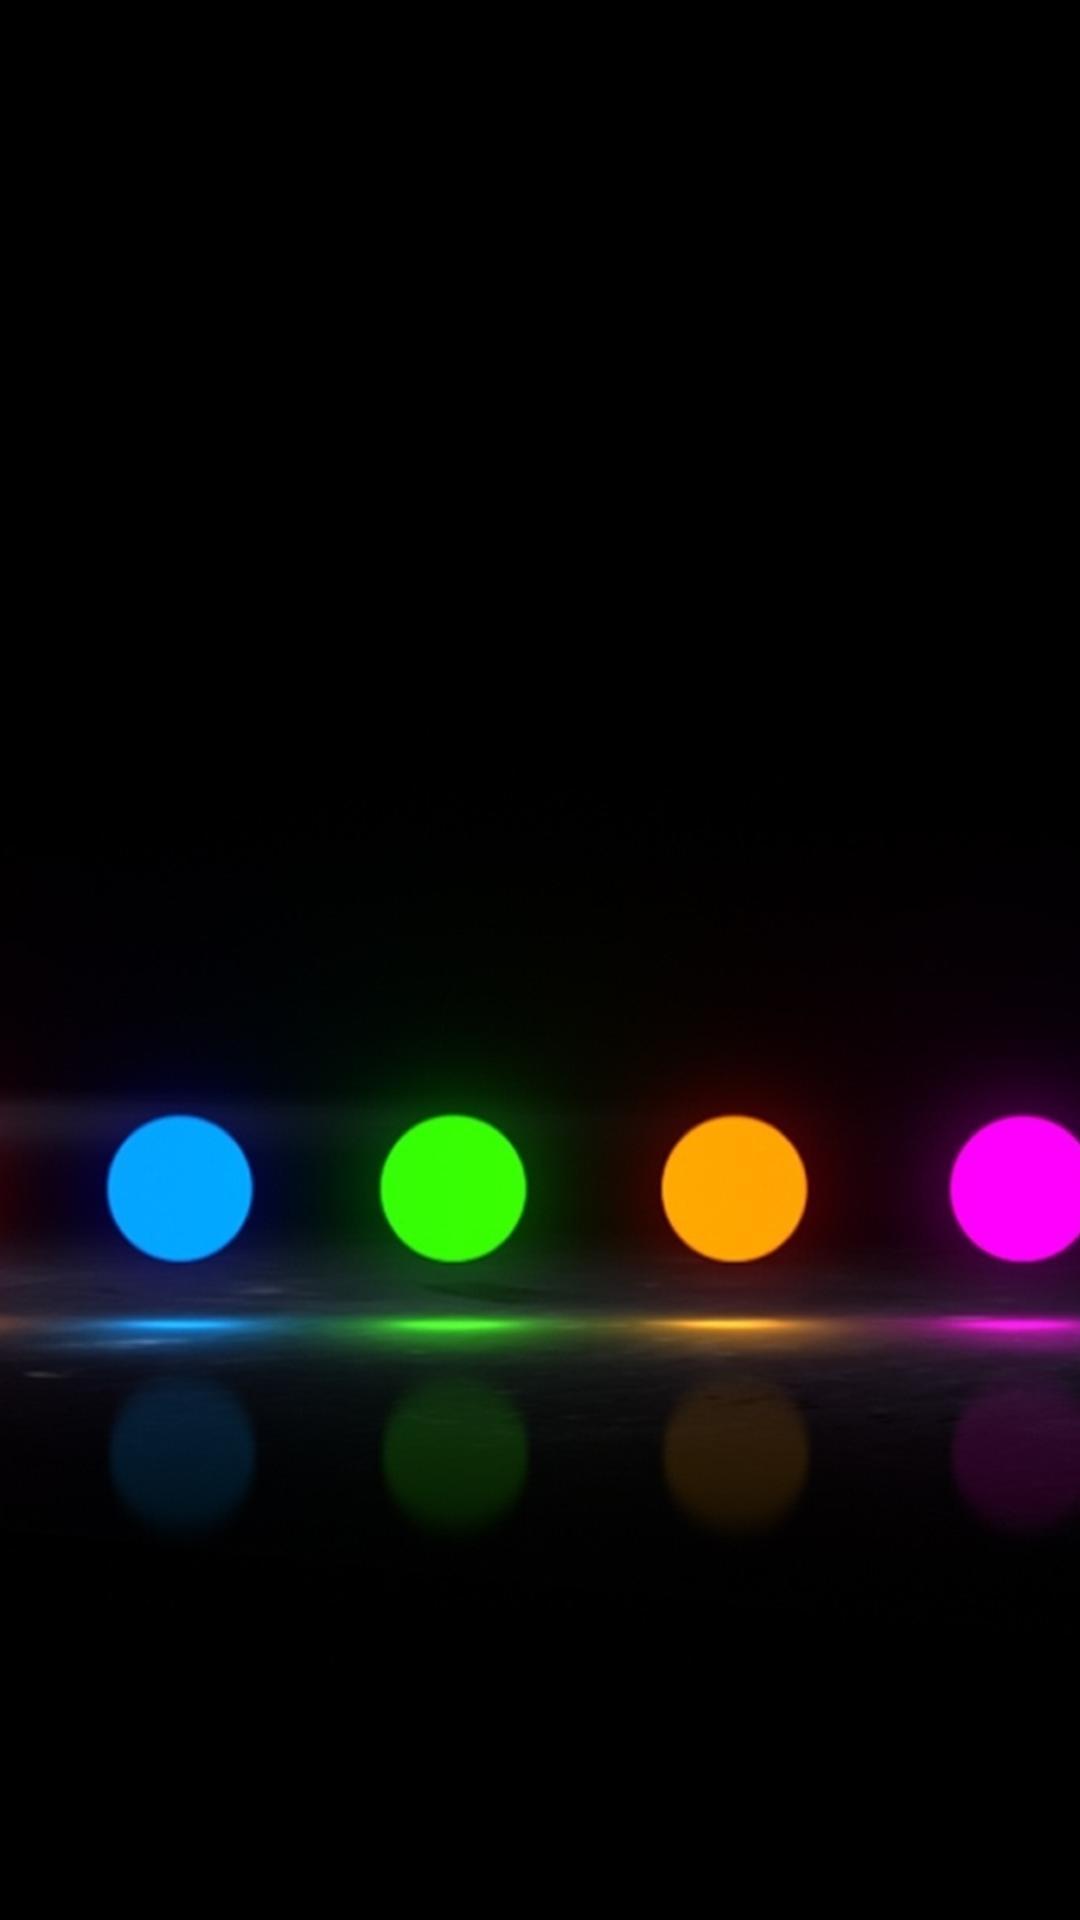 iphone 21s wallpaper hd 21p,grün,schwarz,licht,blau,beleuchtung ...